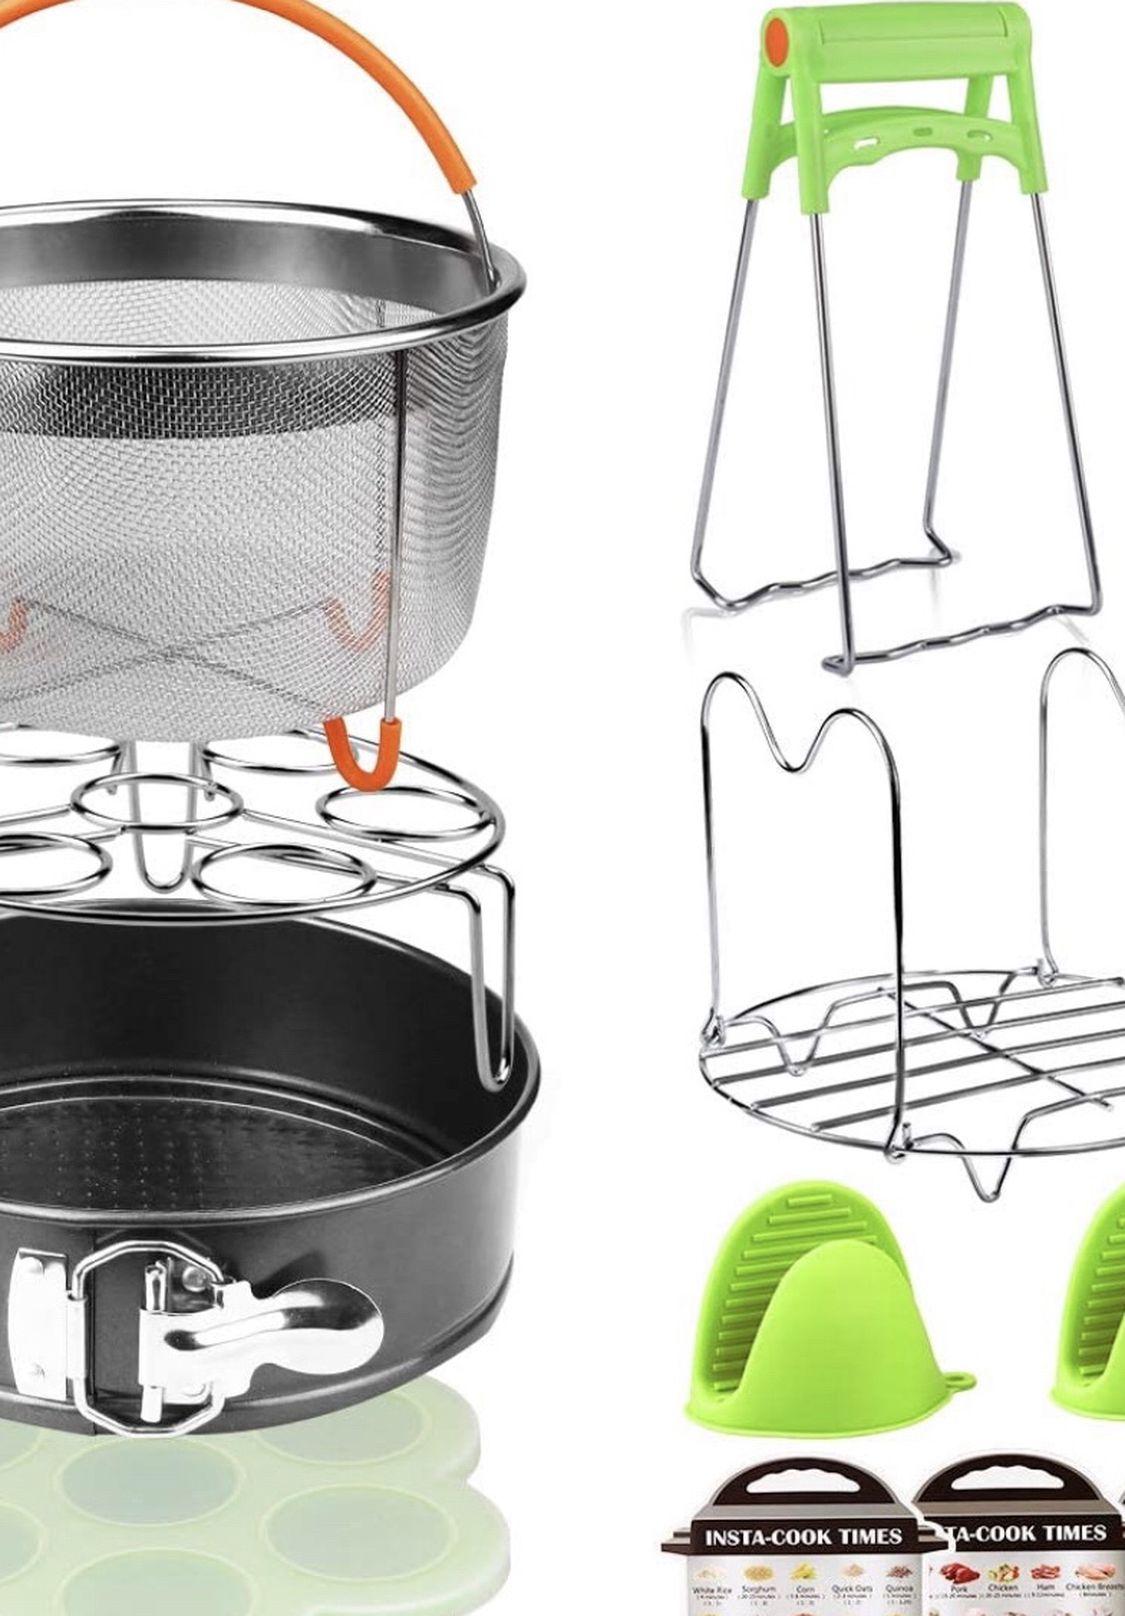 12 Pieces Pressure Cooker Accessories Set,